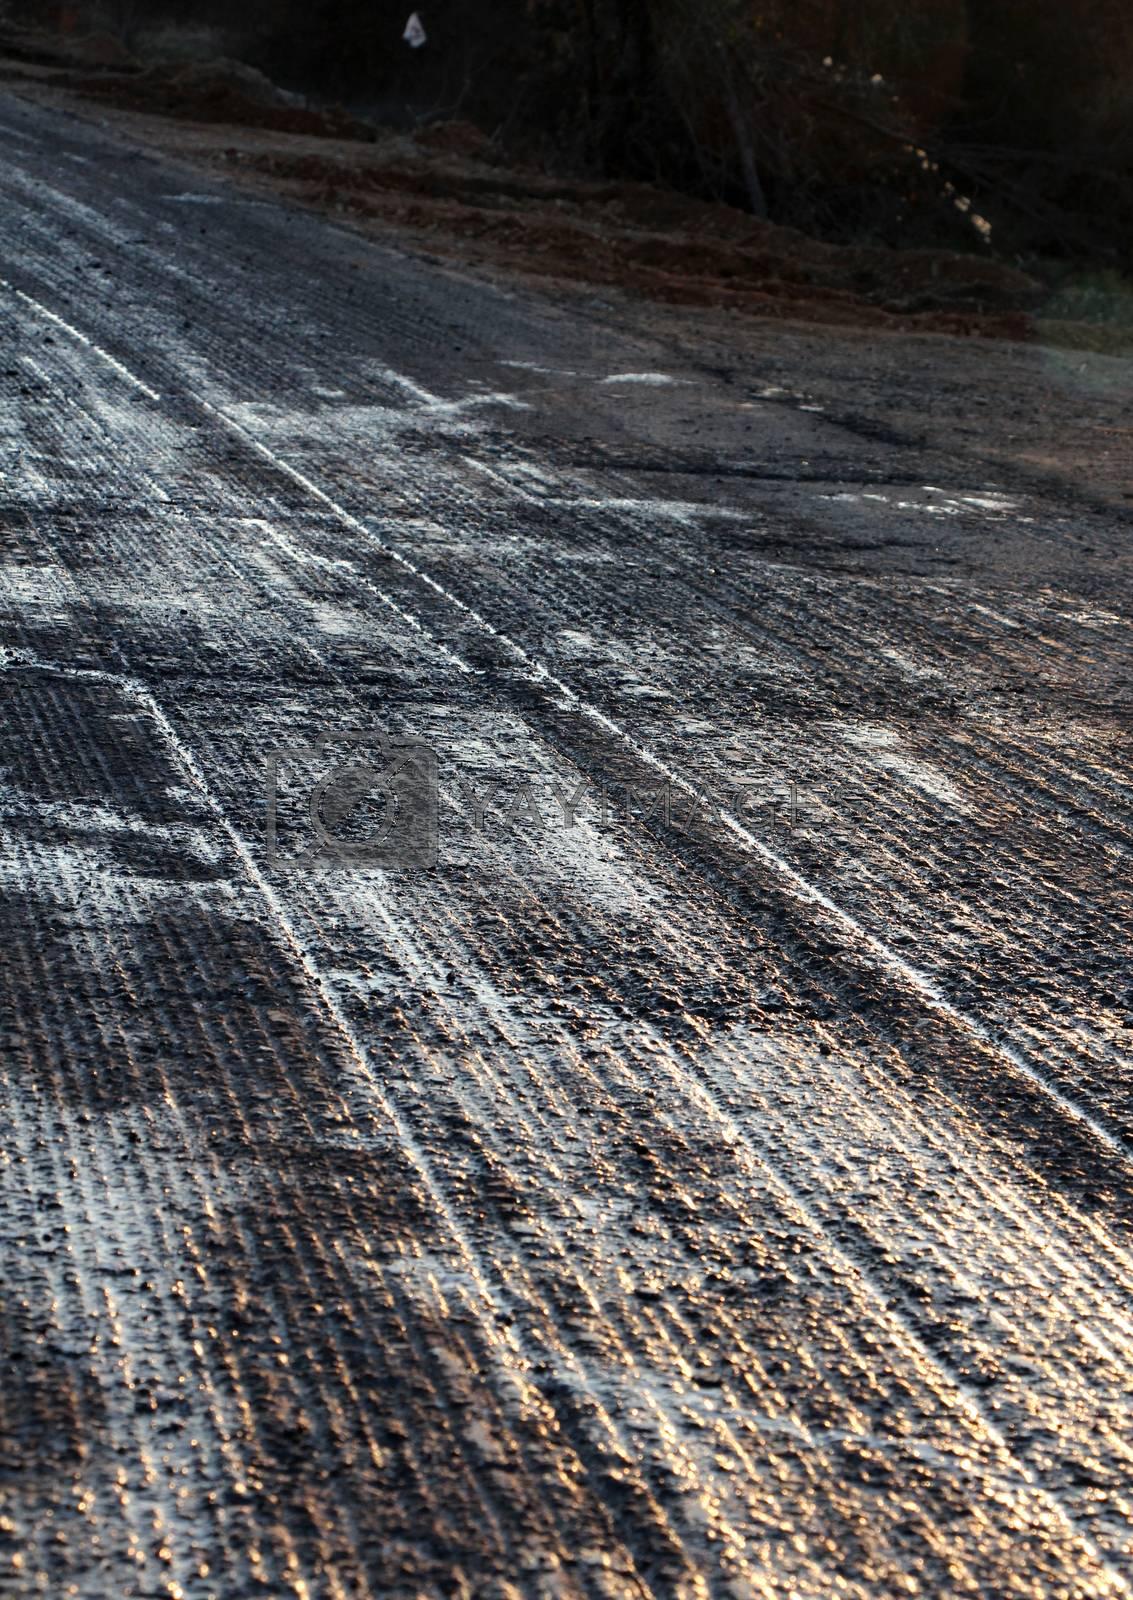 pixture of a repairing asphalt on old road on sunset